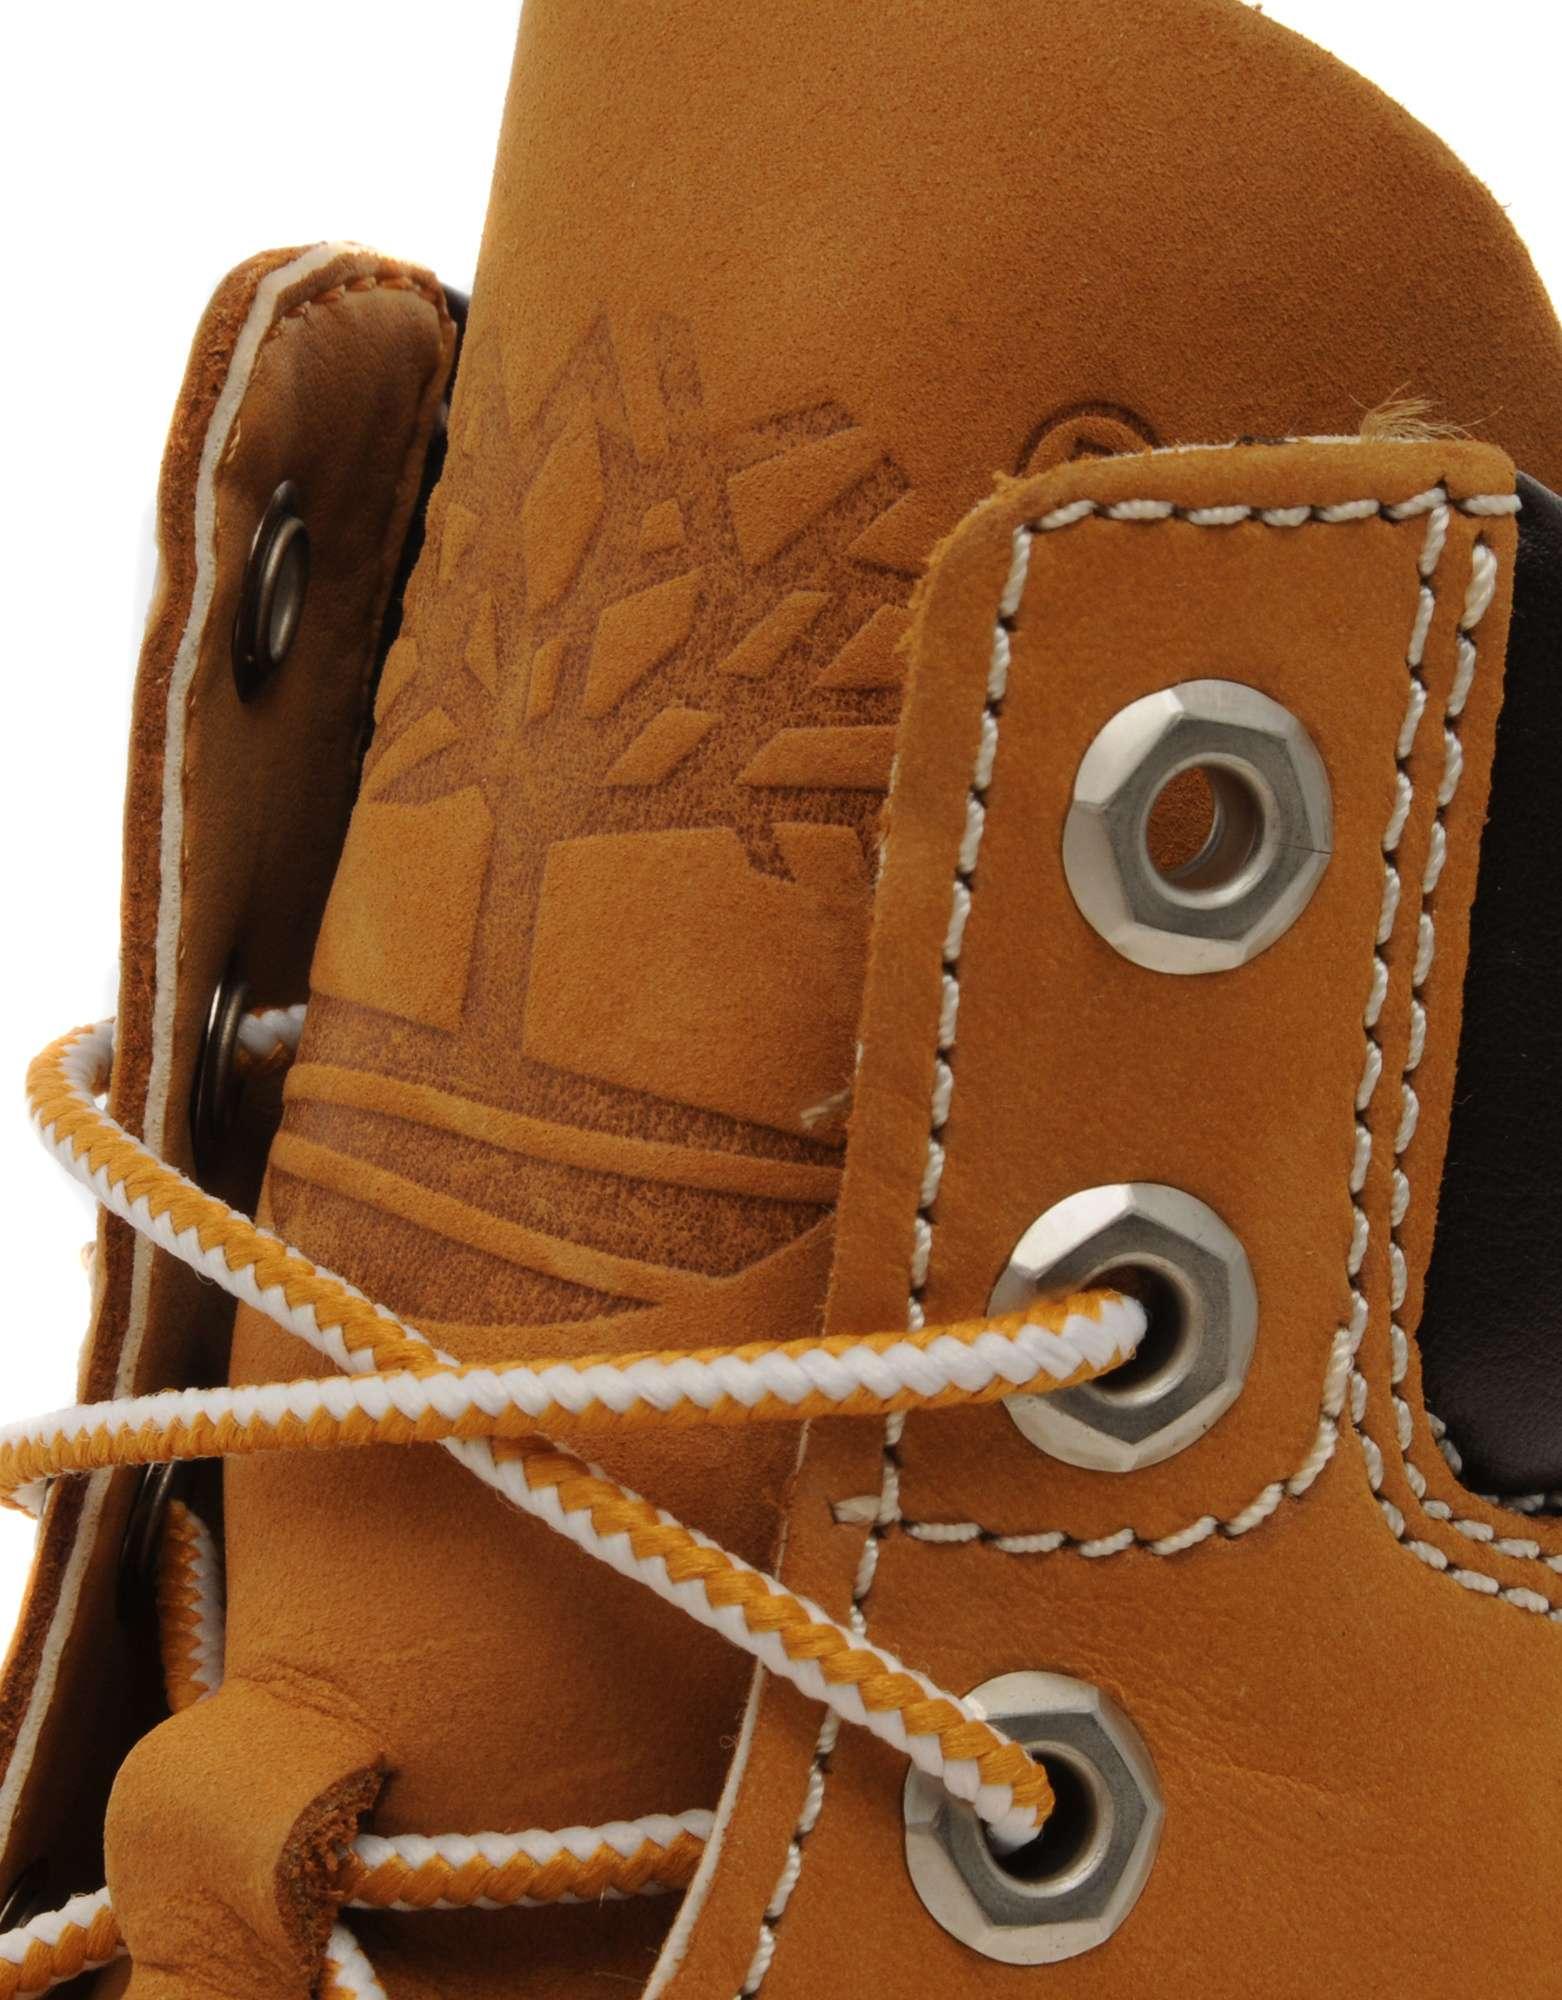 Timberland Earthkeeper Newmarket 6 Inch Boot